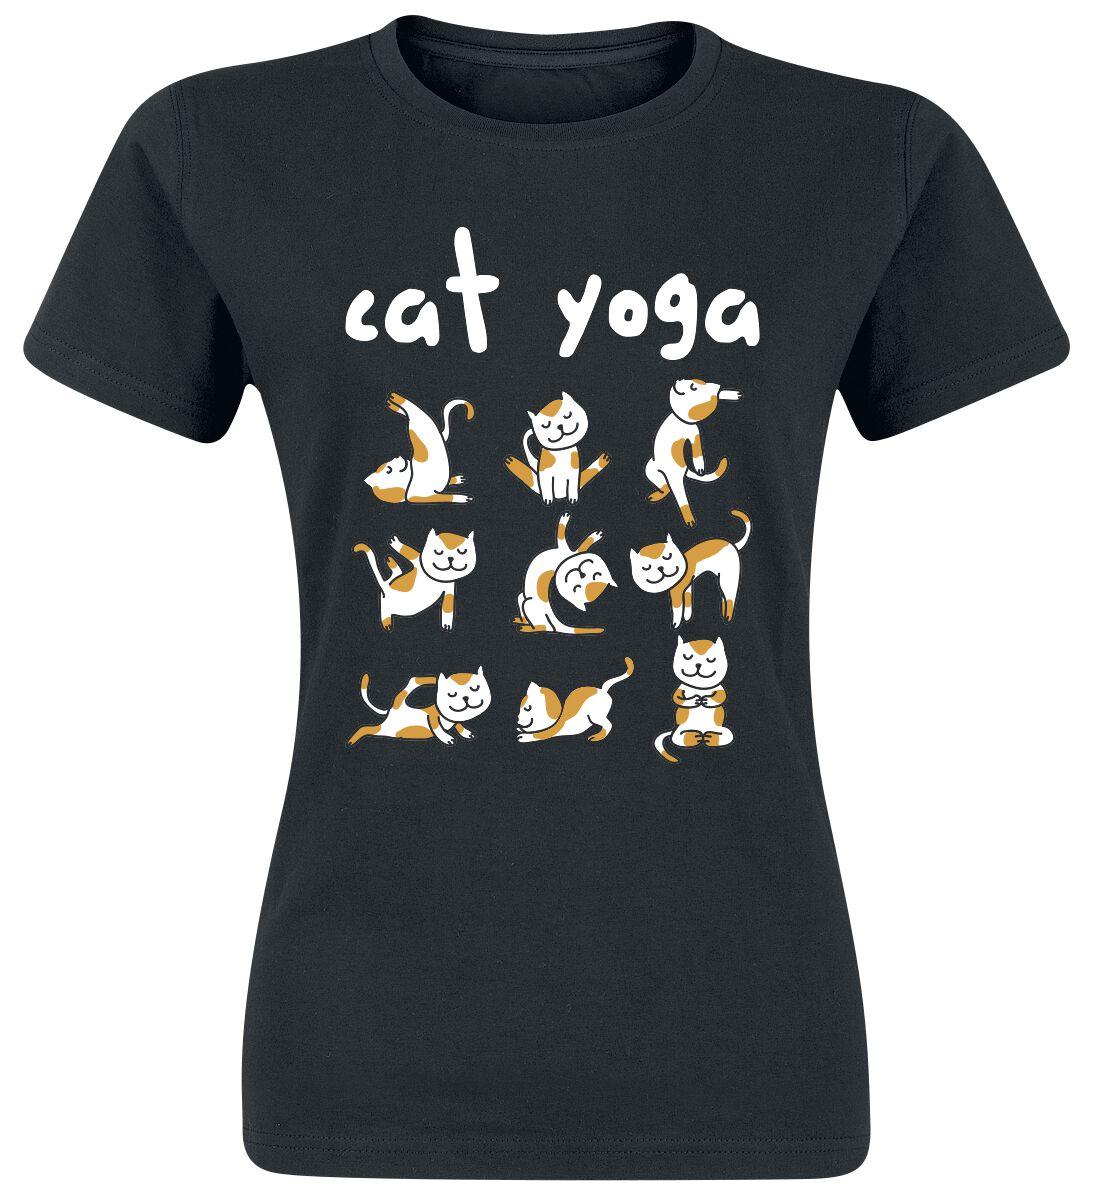 Fun Shirts - Koszulki - Koszulka damska Cat Yoga Koszulka damska czarny - 337130